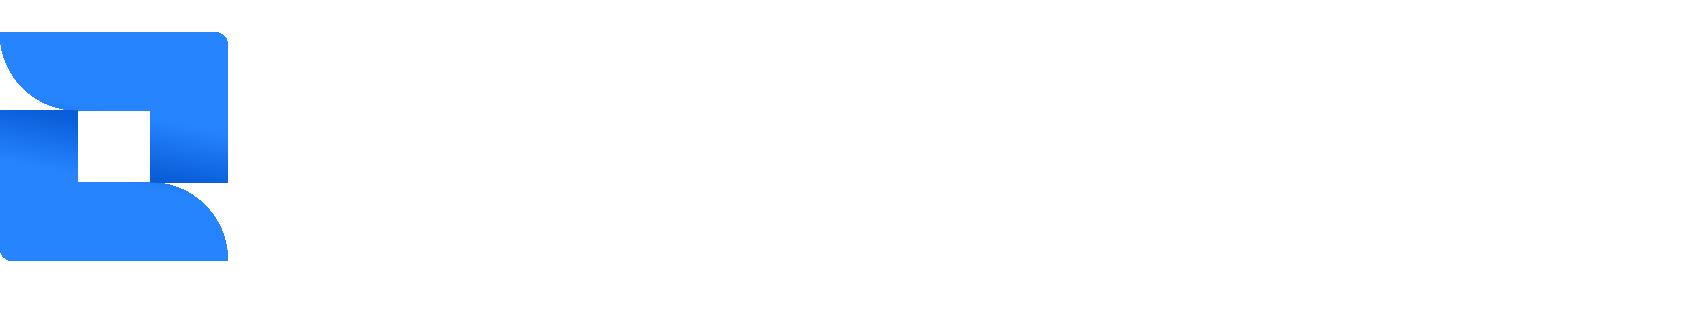 Jira-Align-img